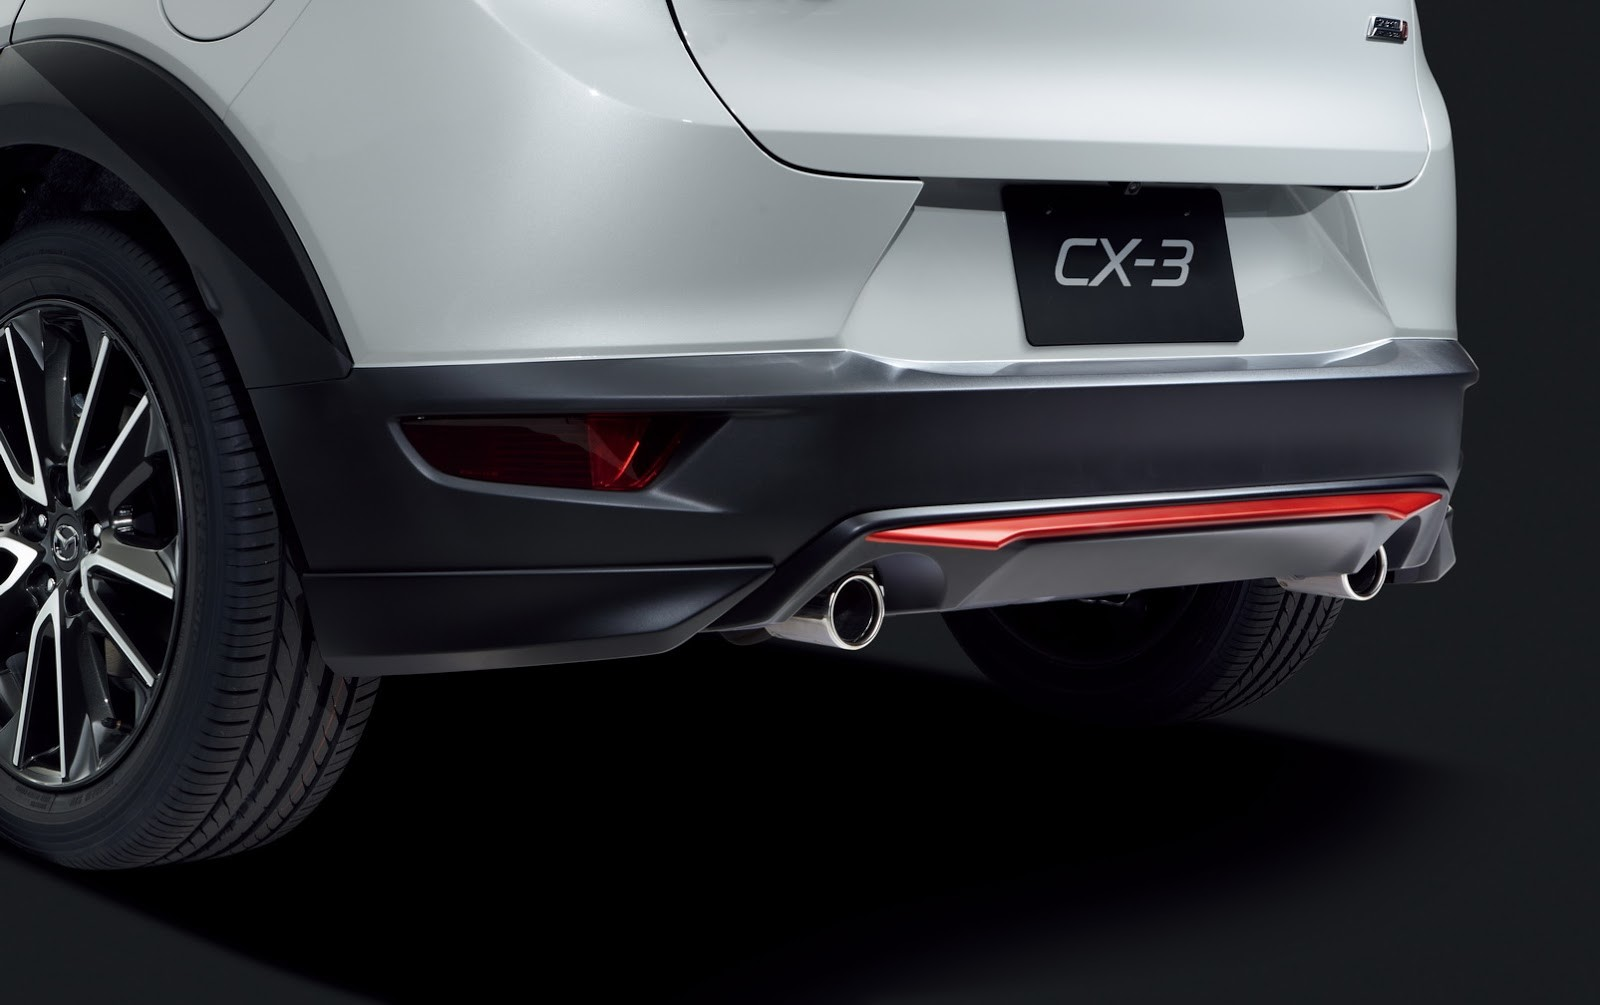 Foto de Accesorios para Mazda CX-3 - CX-5 (9/12)